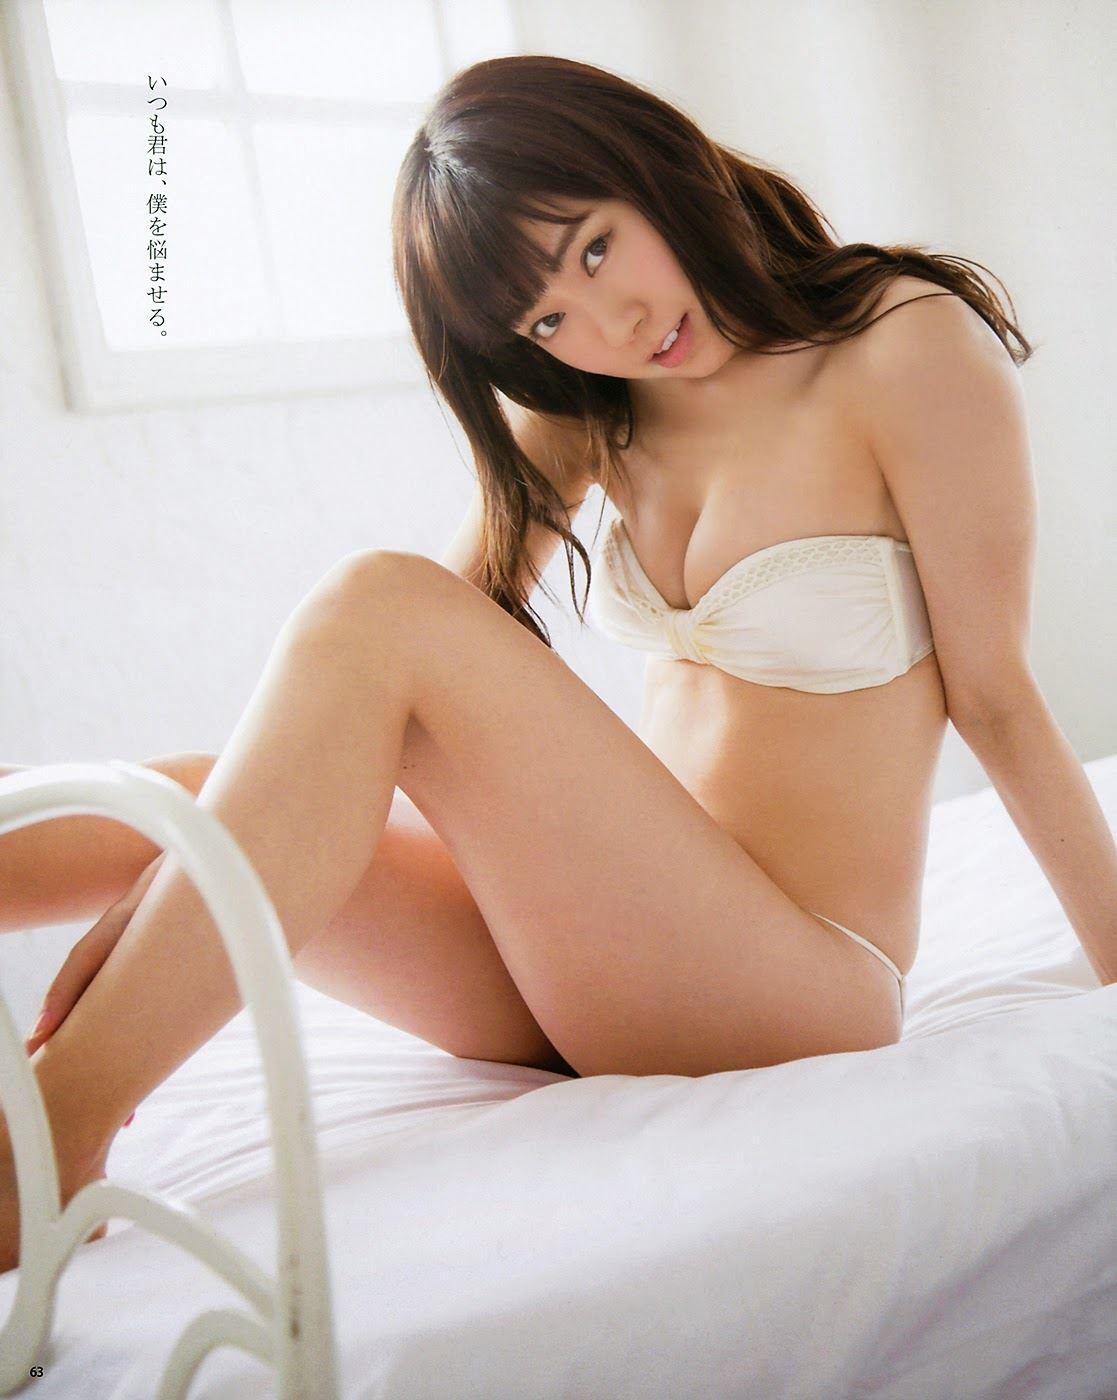 渡辺美優紀 エロ画像 98